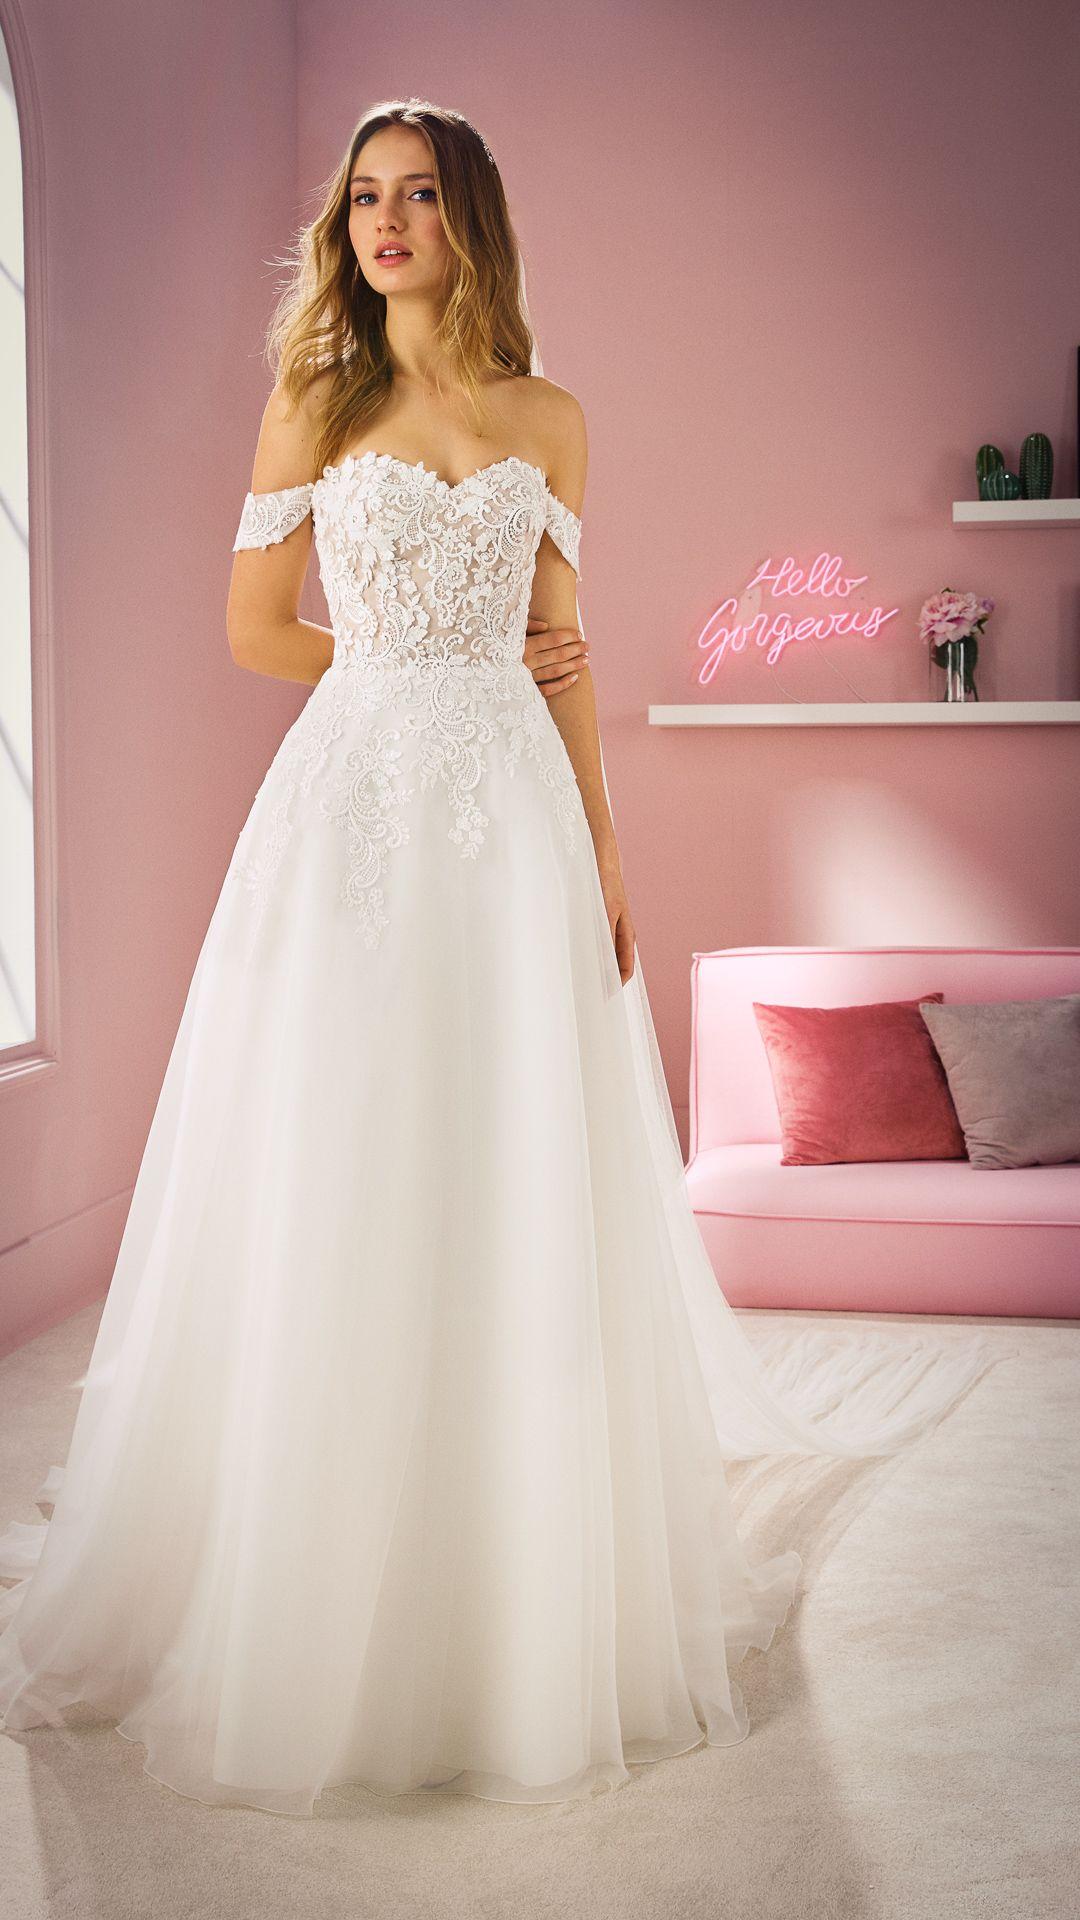 Hochzeitskleider 3 White One Kollektion Modell: DUA-B